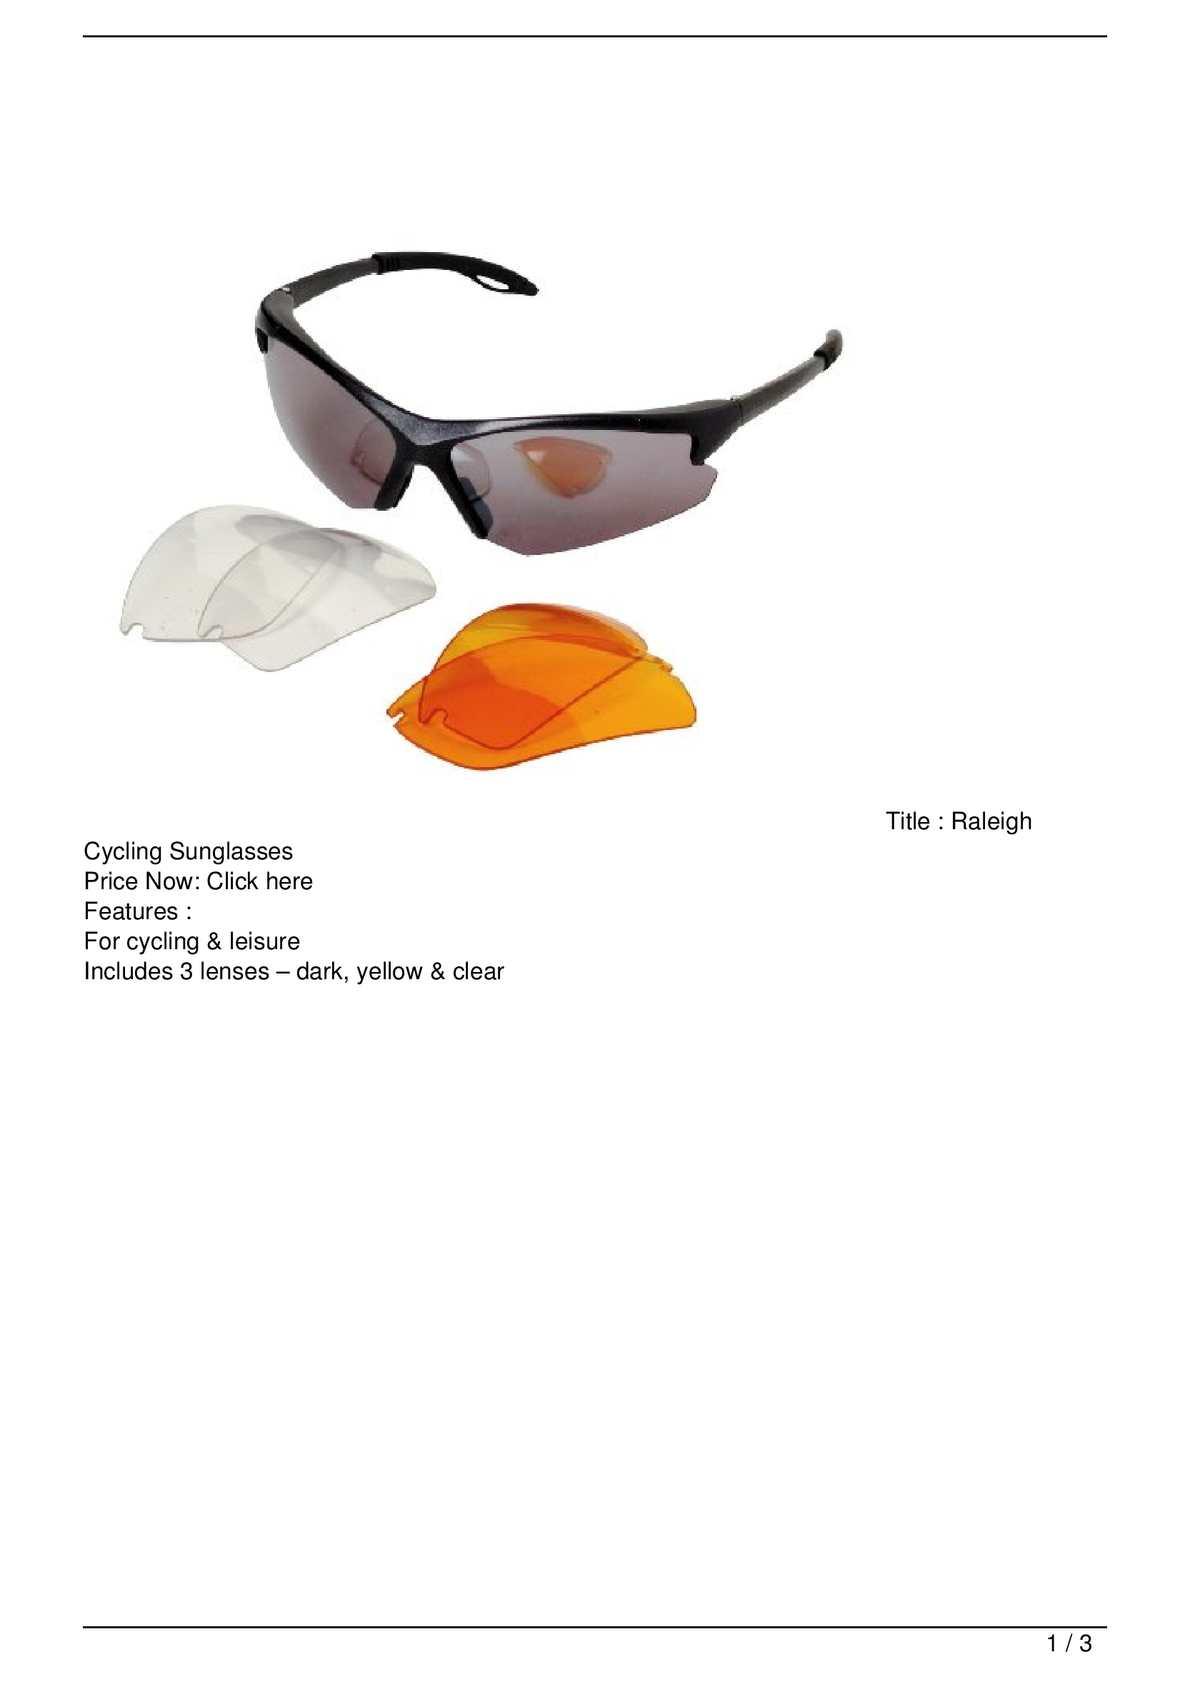 8a7c225fd5 Calaméo - Raleigh Cycling Sunglasses Discount !!